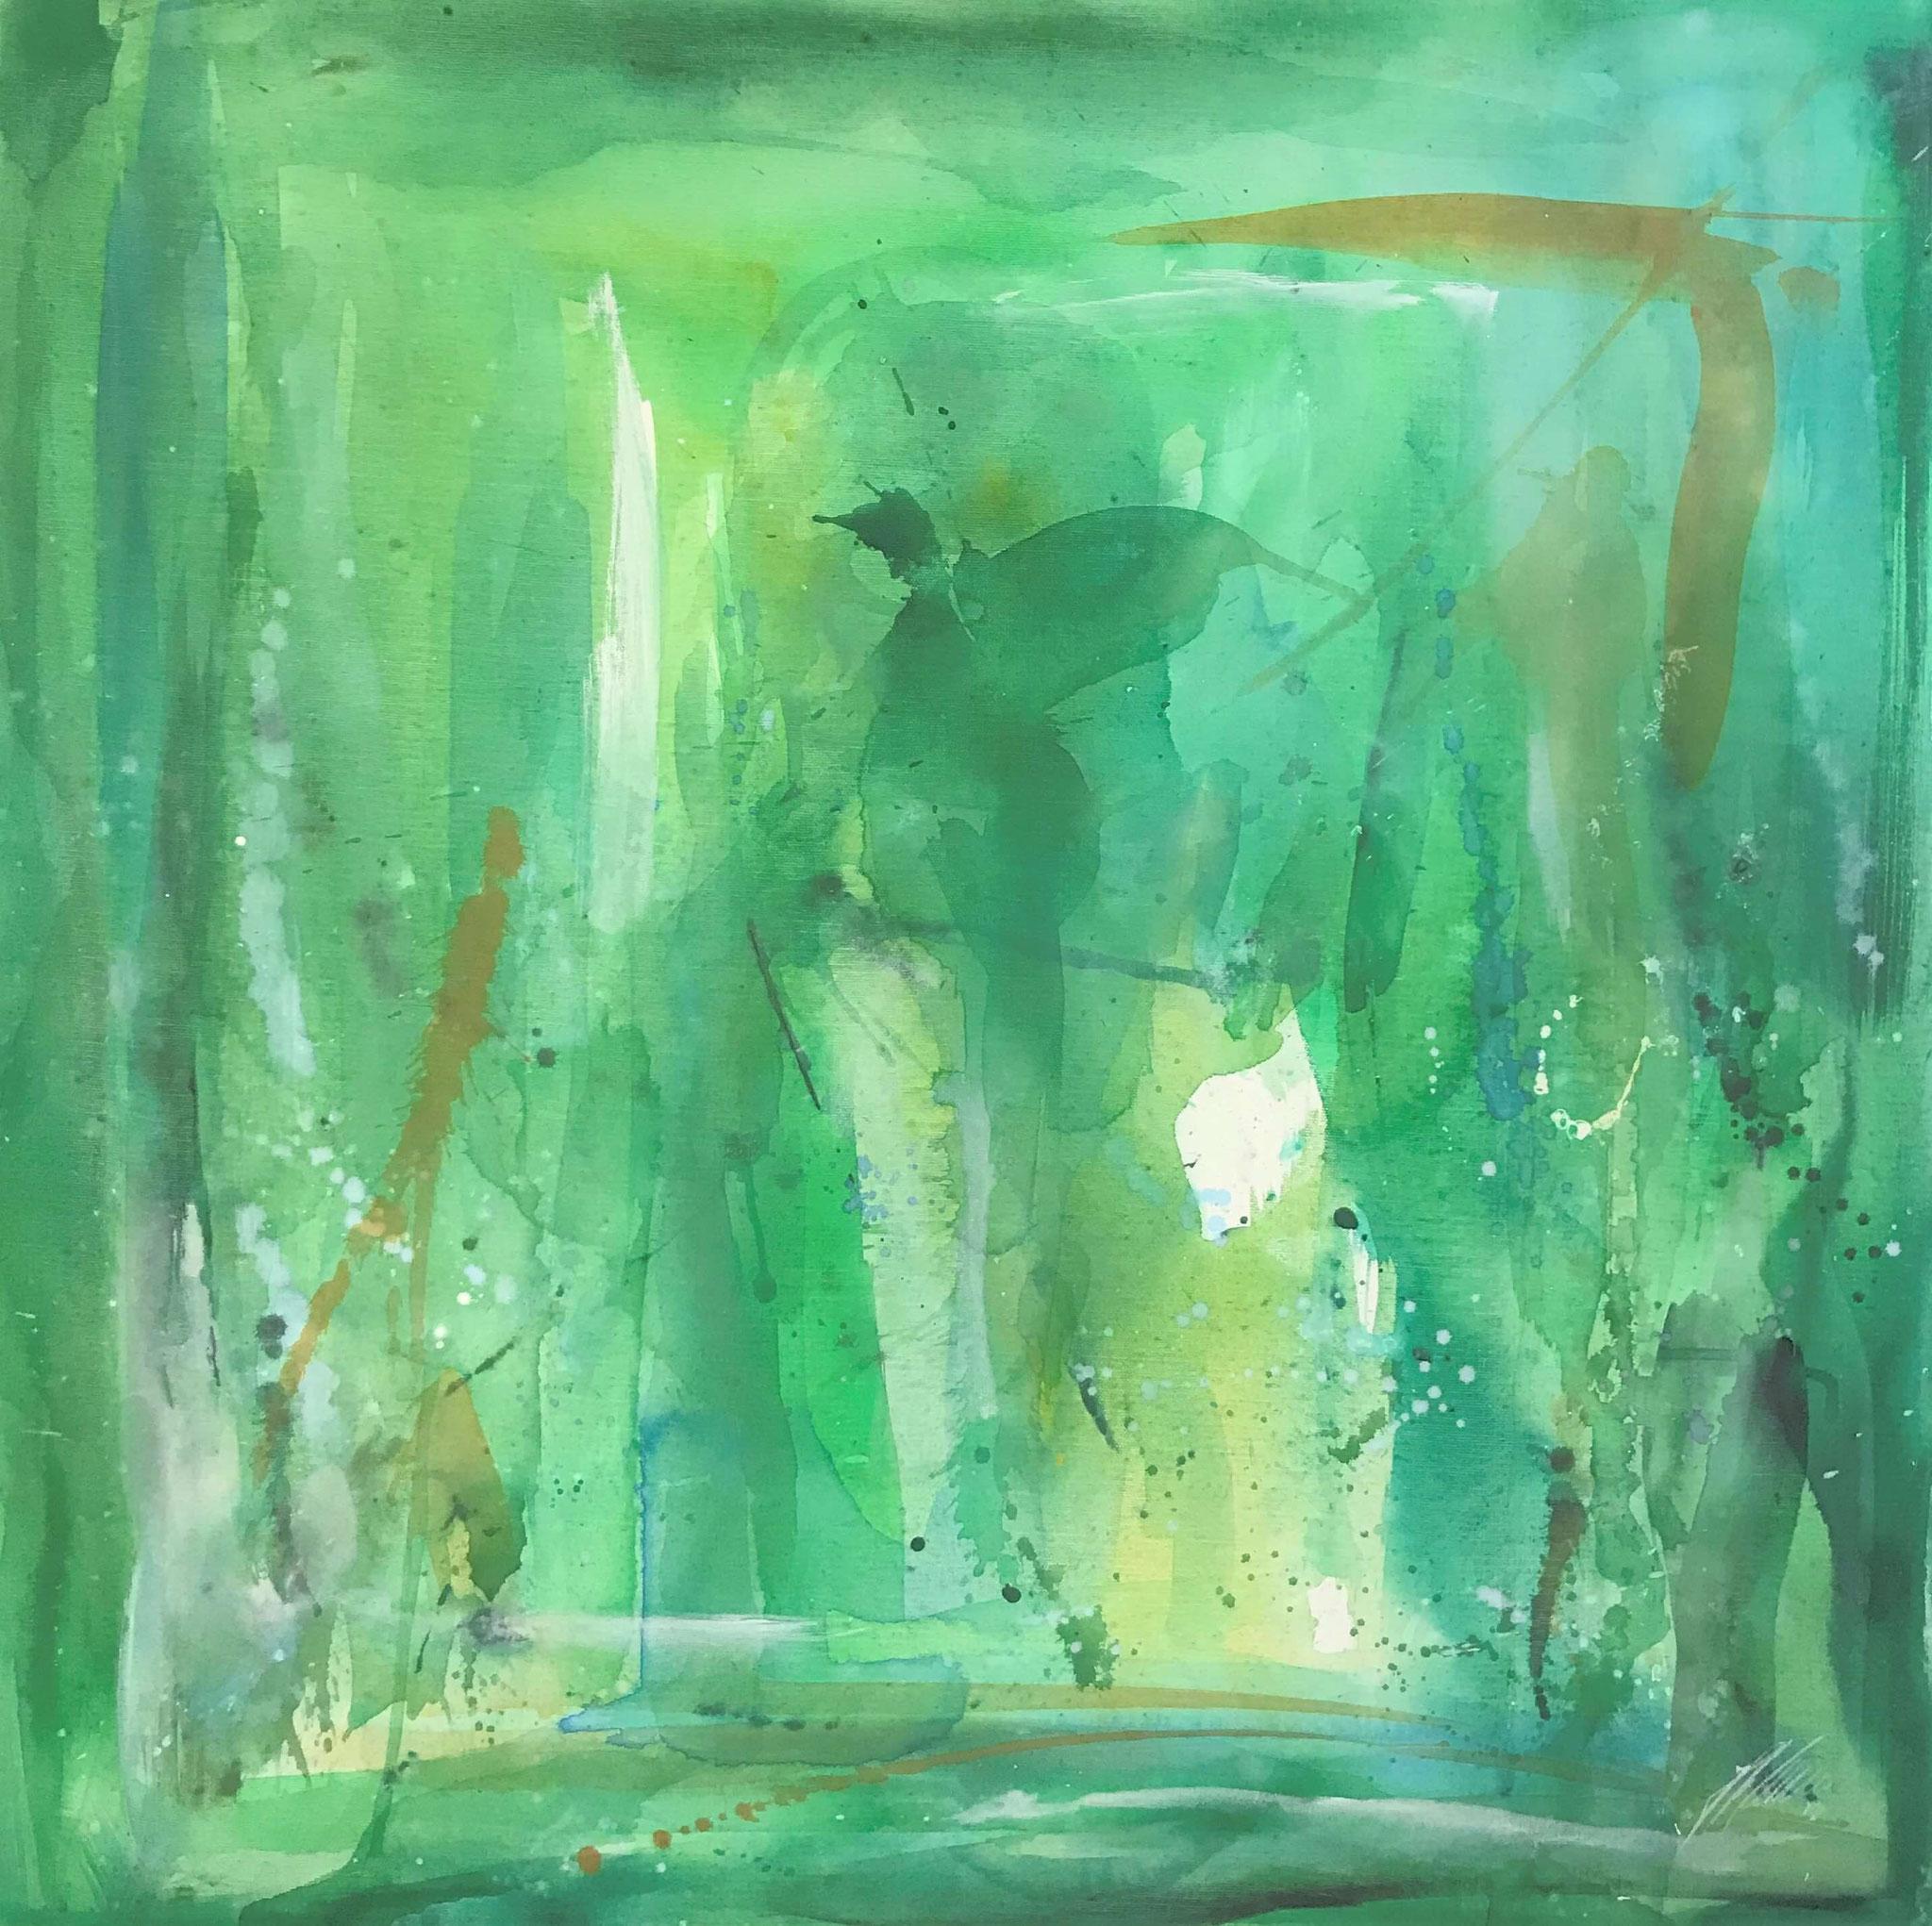 "Fr. 560.00 ""Jungfrau, Serie abstract"" Acryl auf Leinwand mit Rahmen 80 x 80cm."